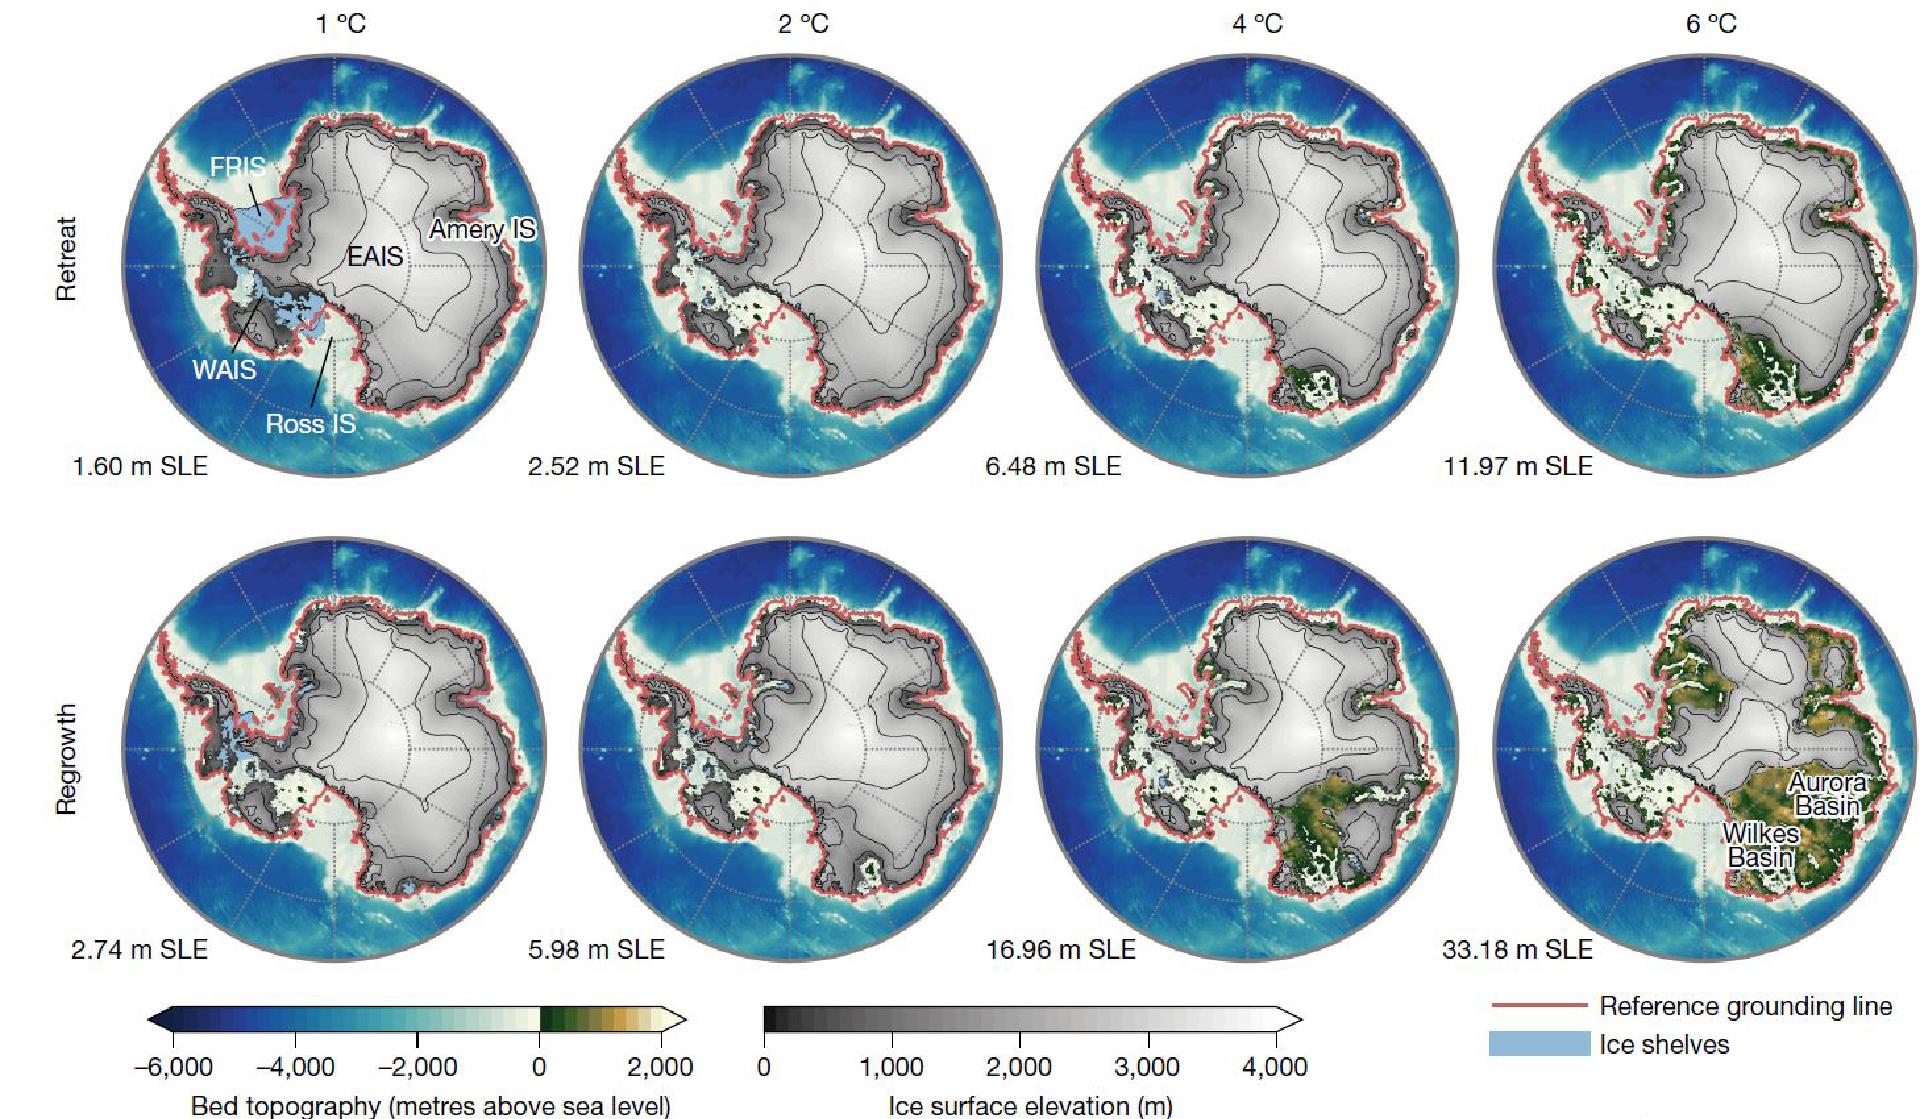 Antarctica's ice sheet melt